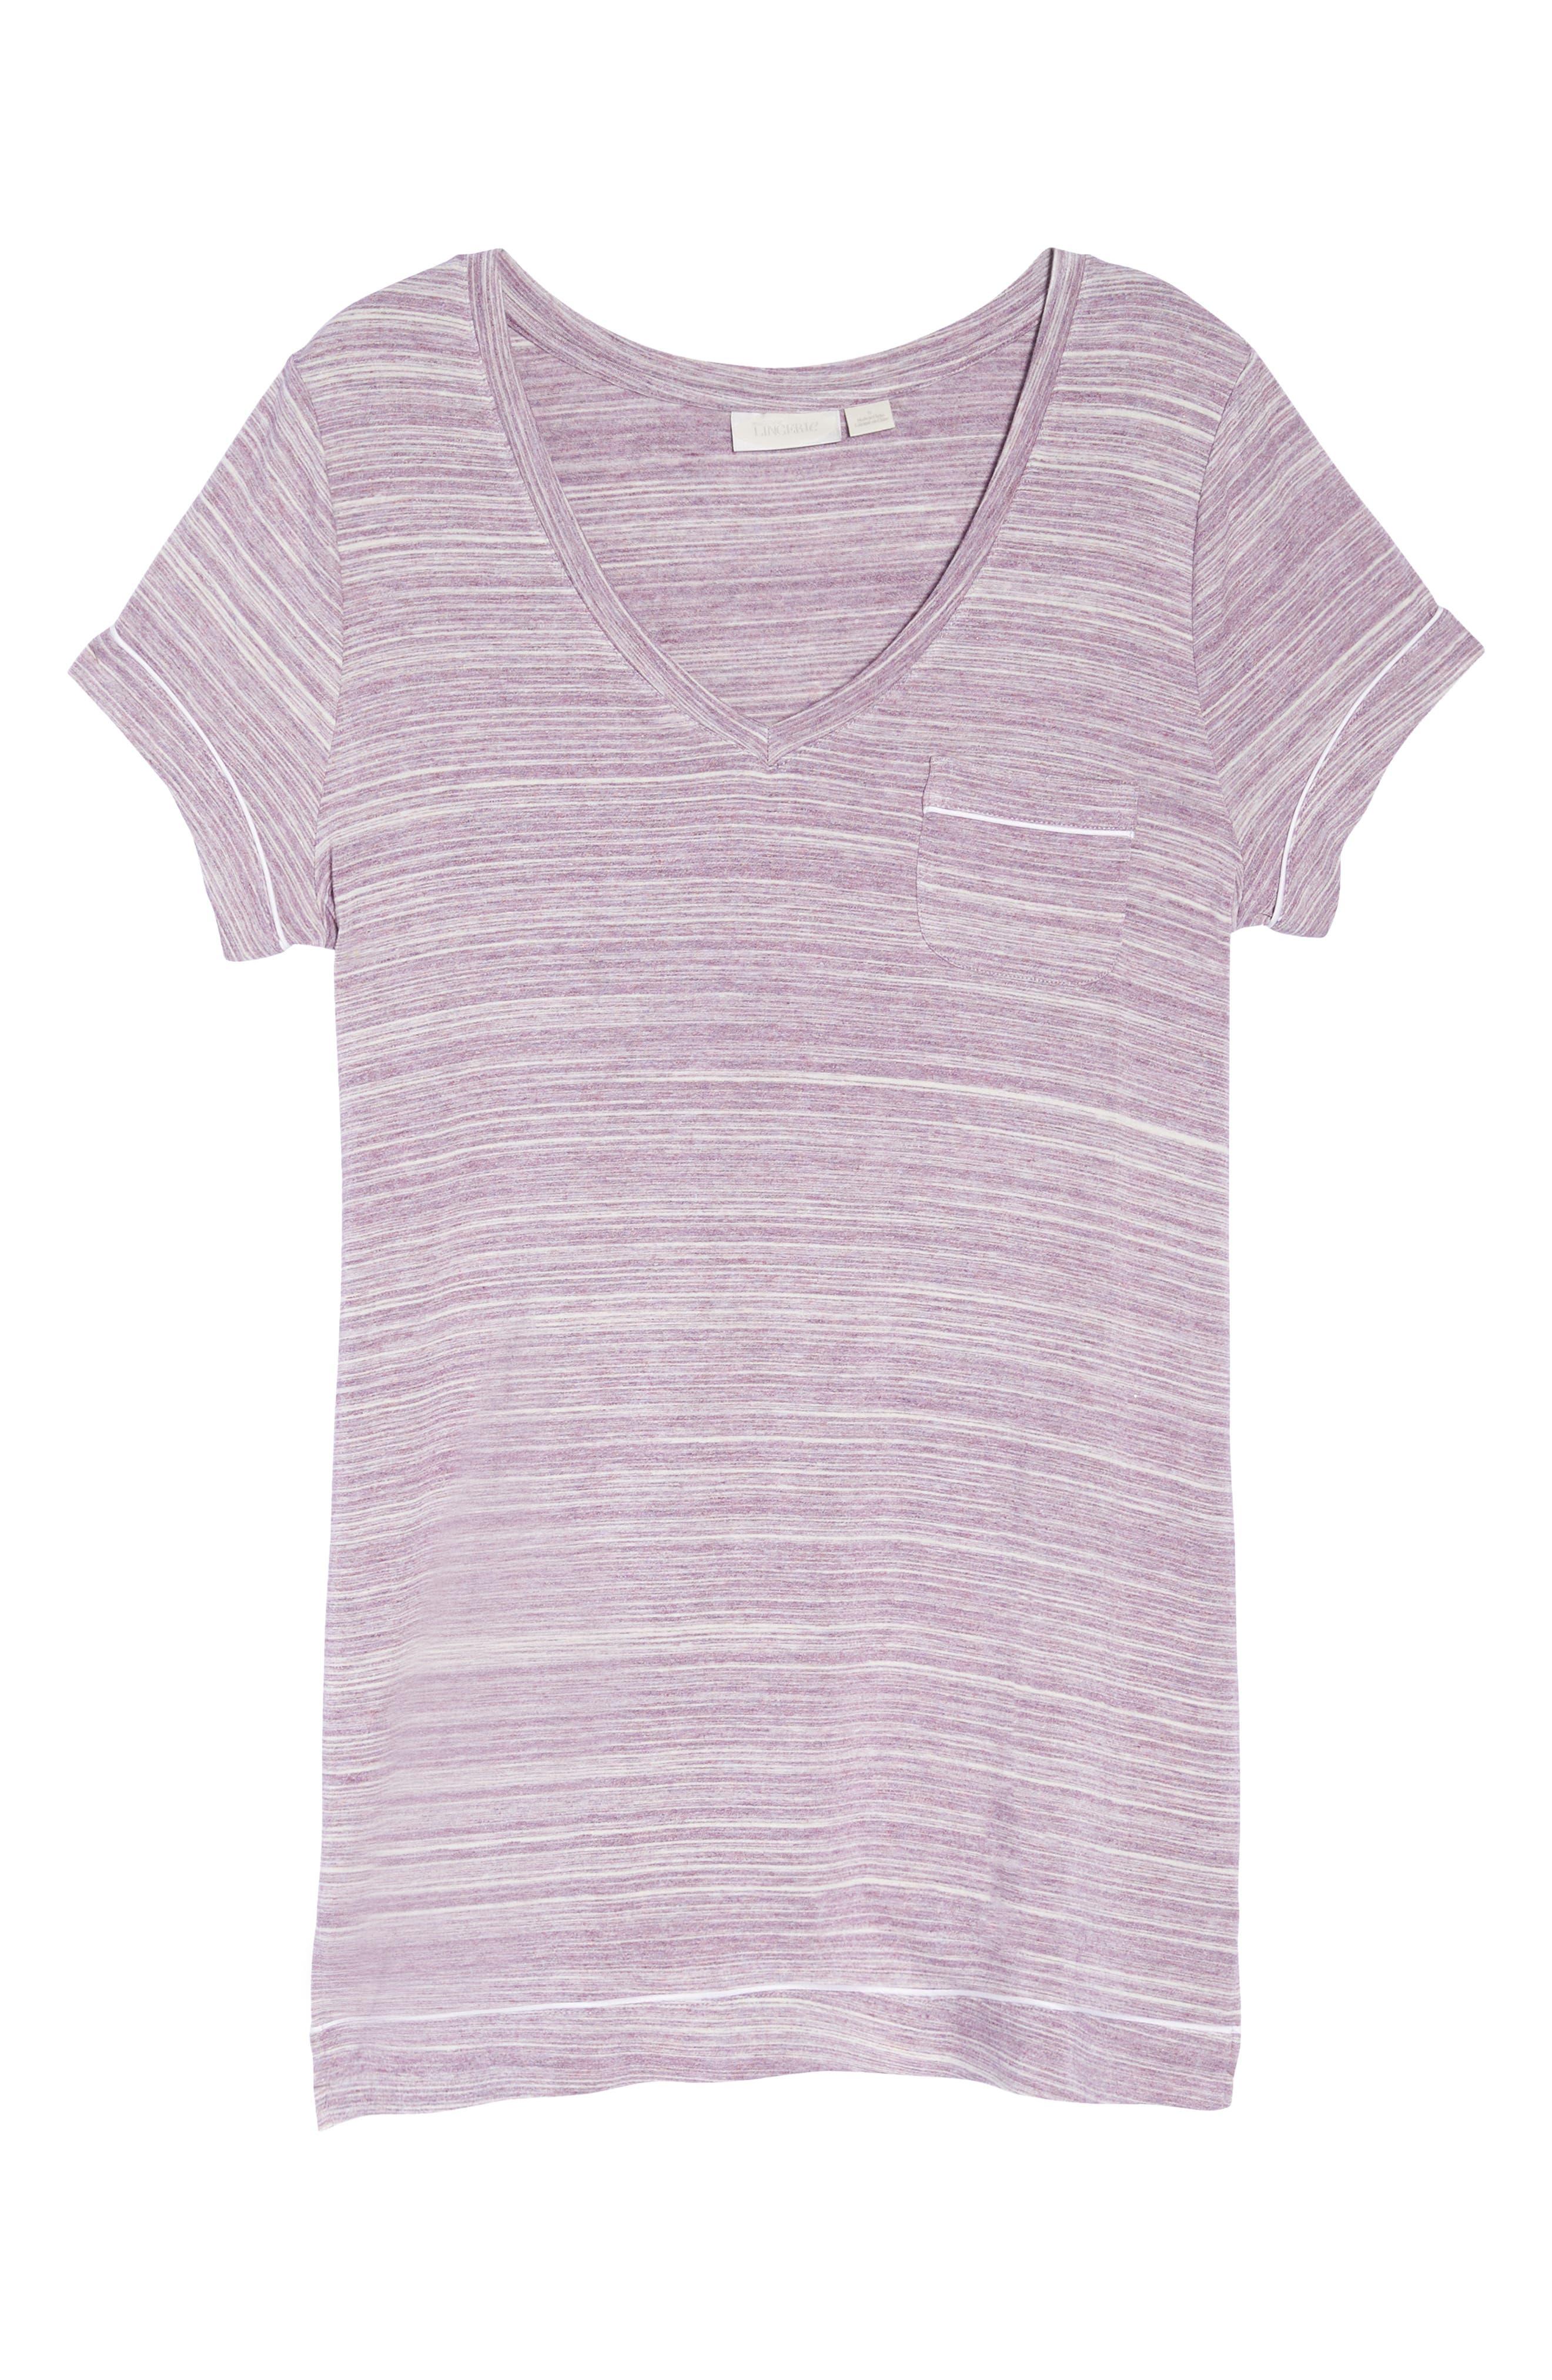 Moonlight Sleep Shirt,                             Alternate thumbnail 6, color,                             Purple Spacedye